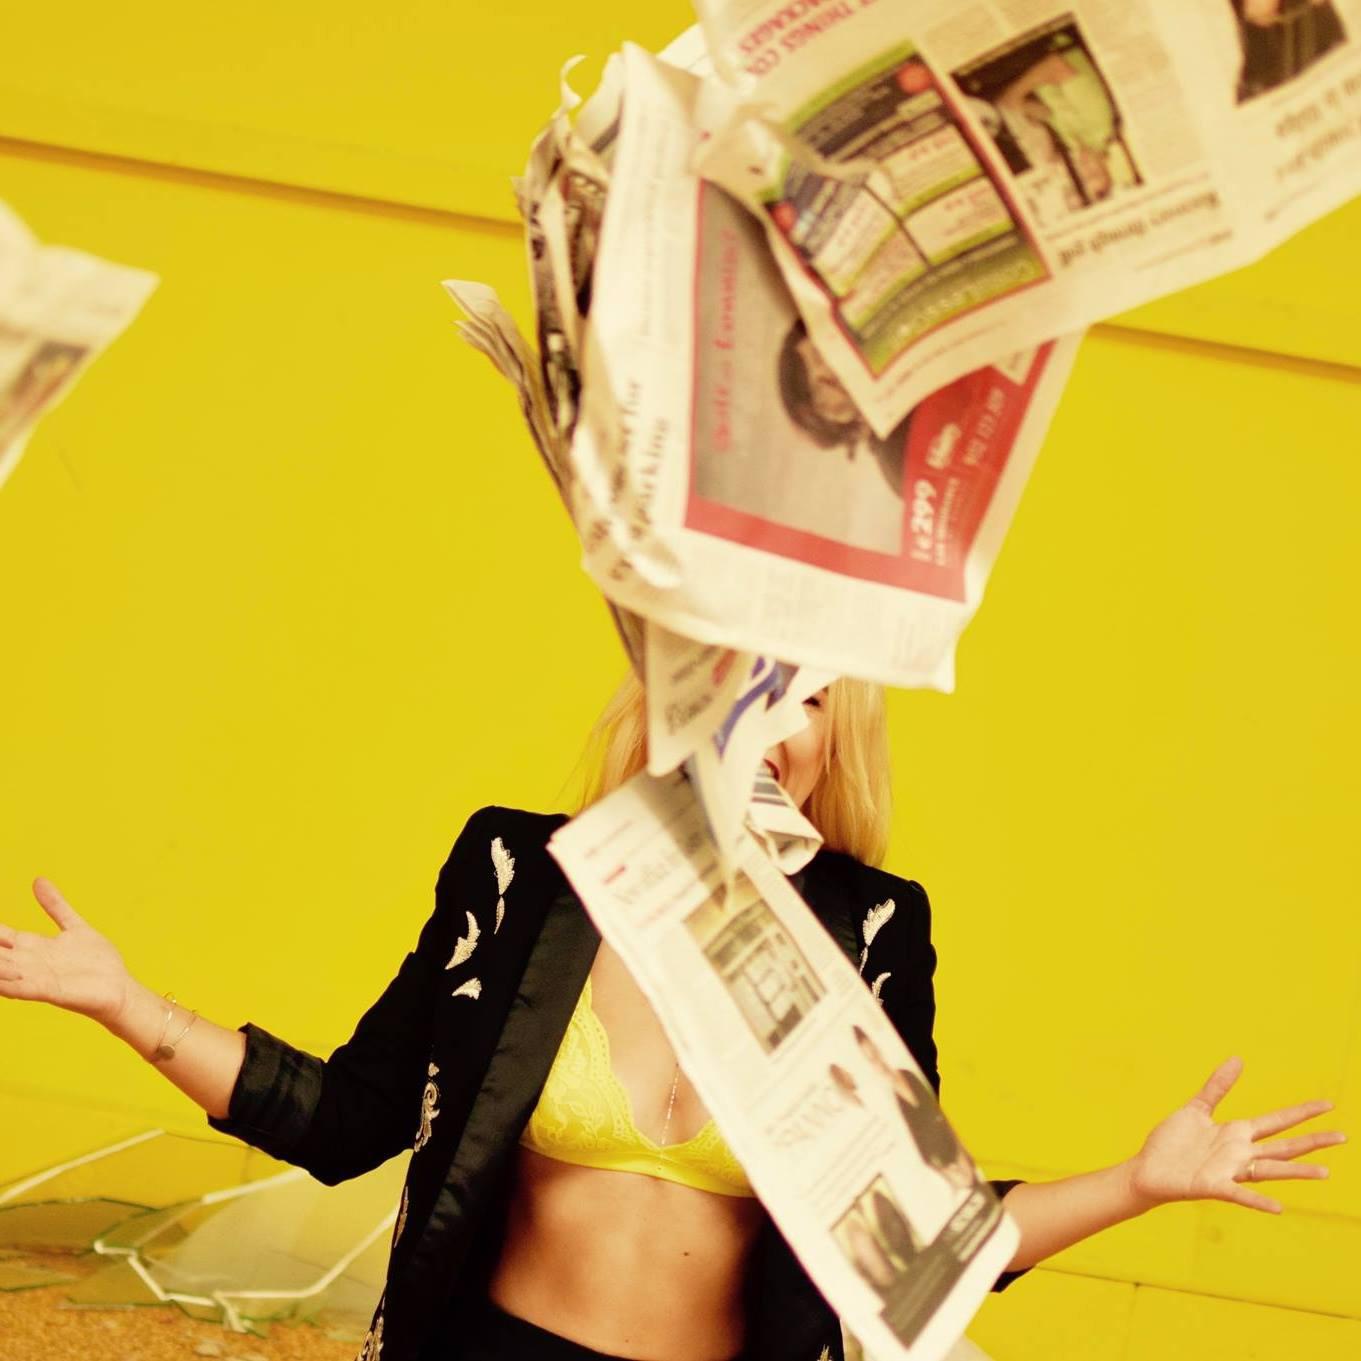 student image - raining newspapers